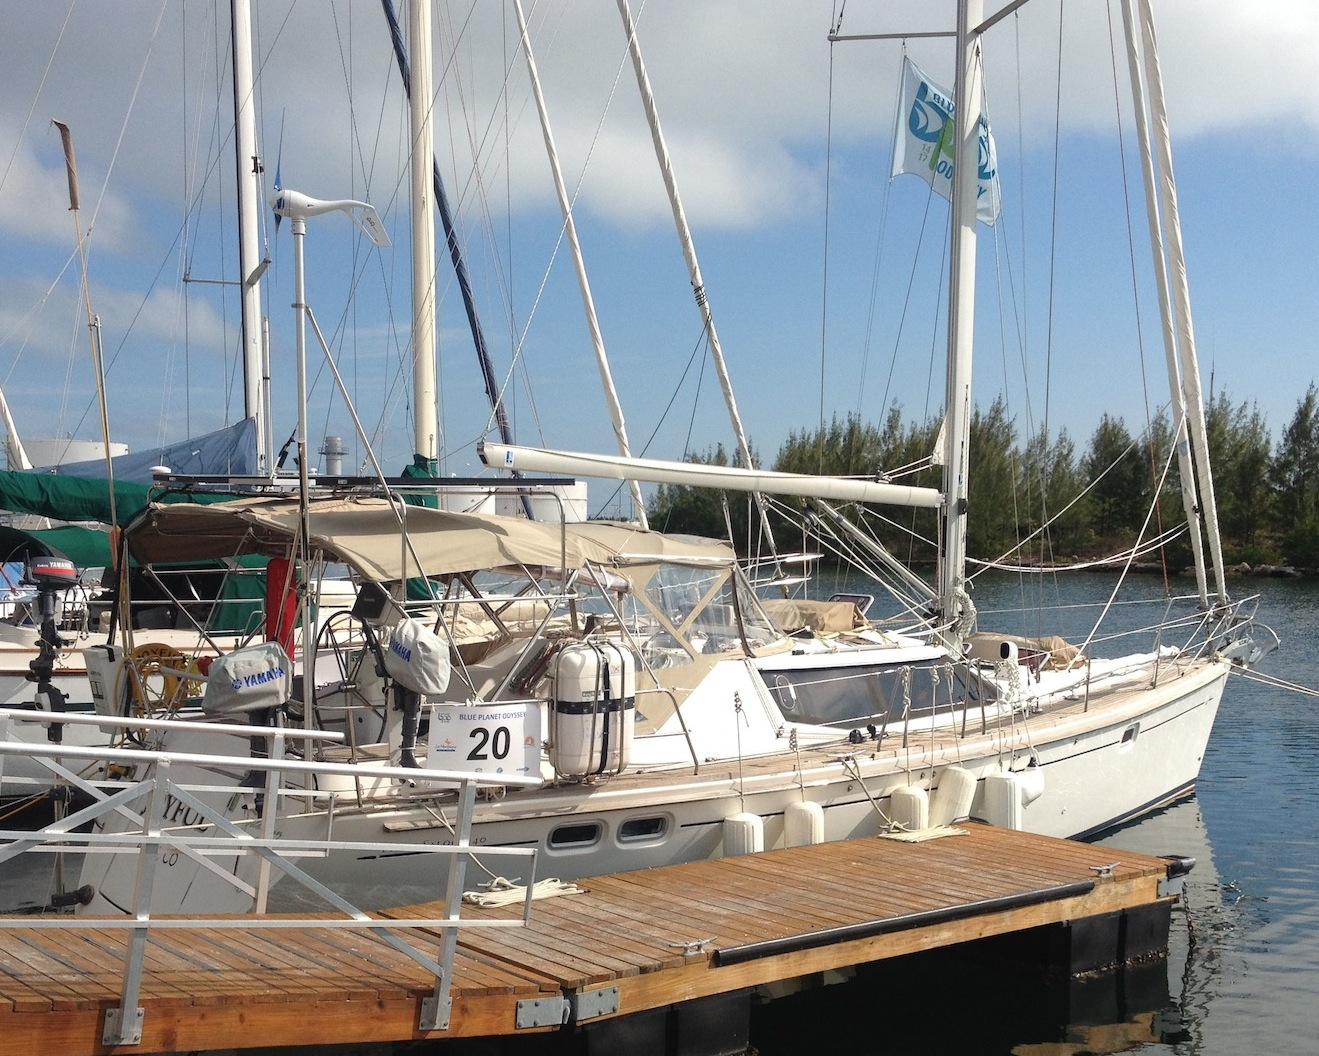 19. Joyful starboard side view at Key West.